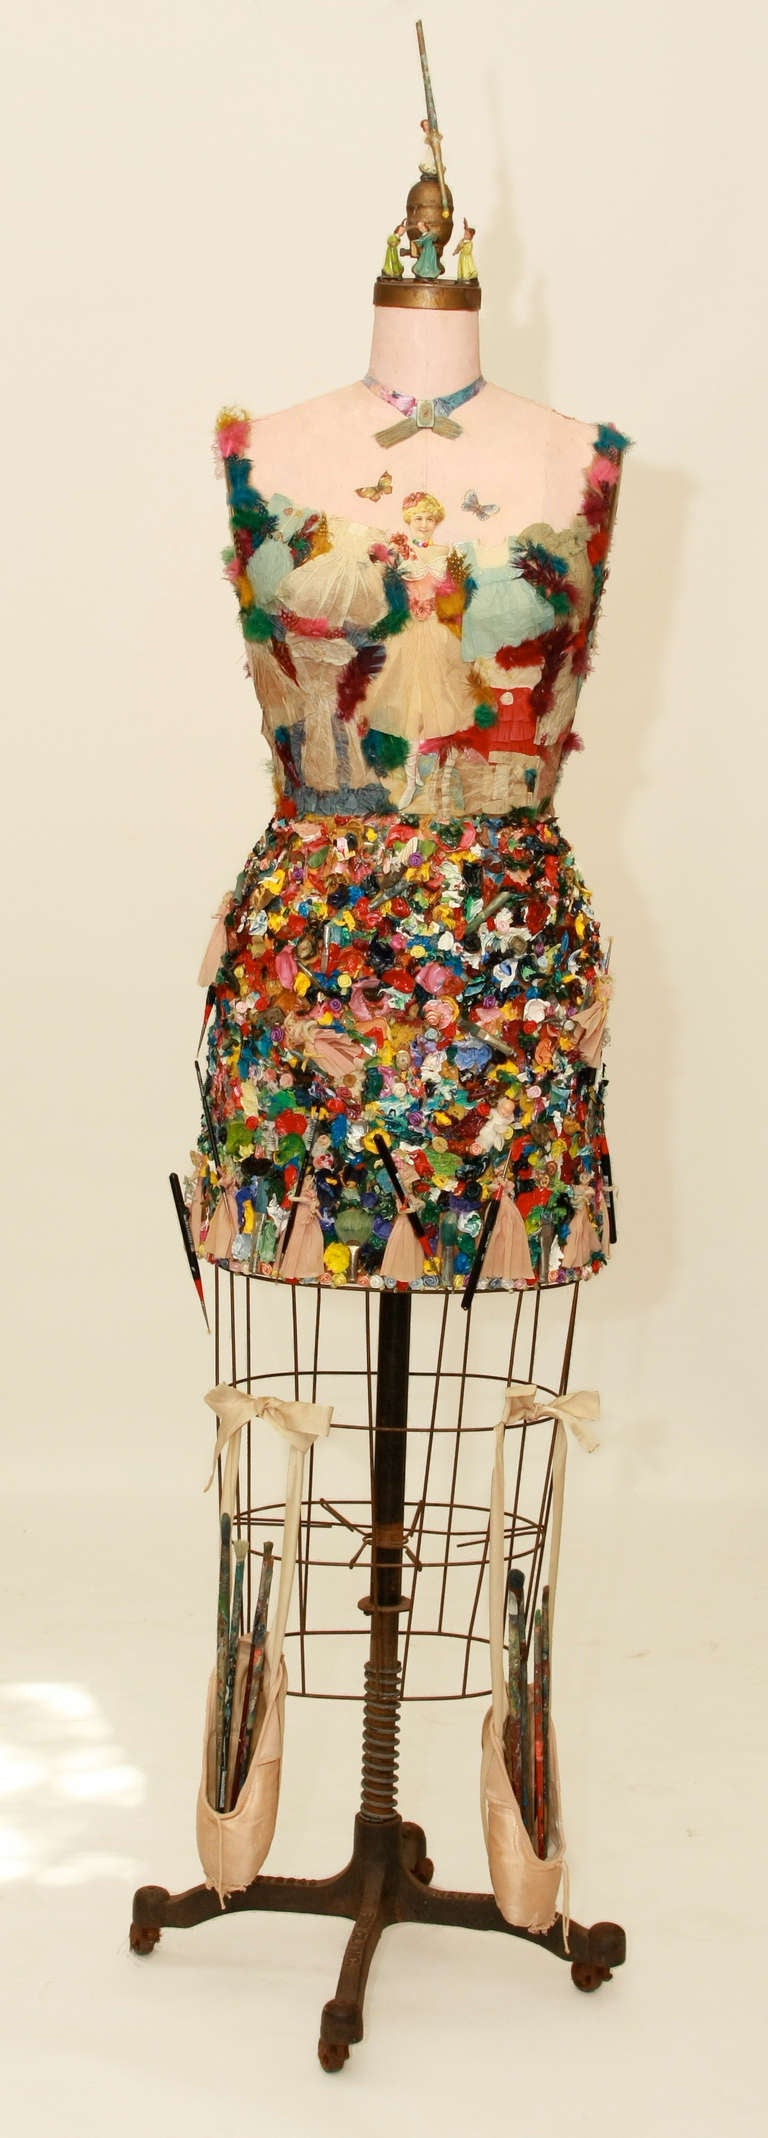 Mixed media vintage dress form sculpture 2